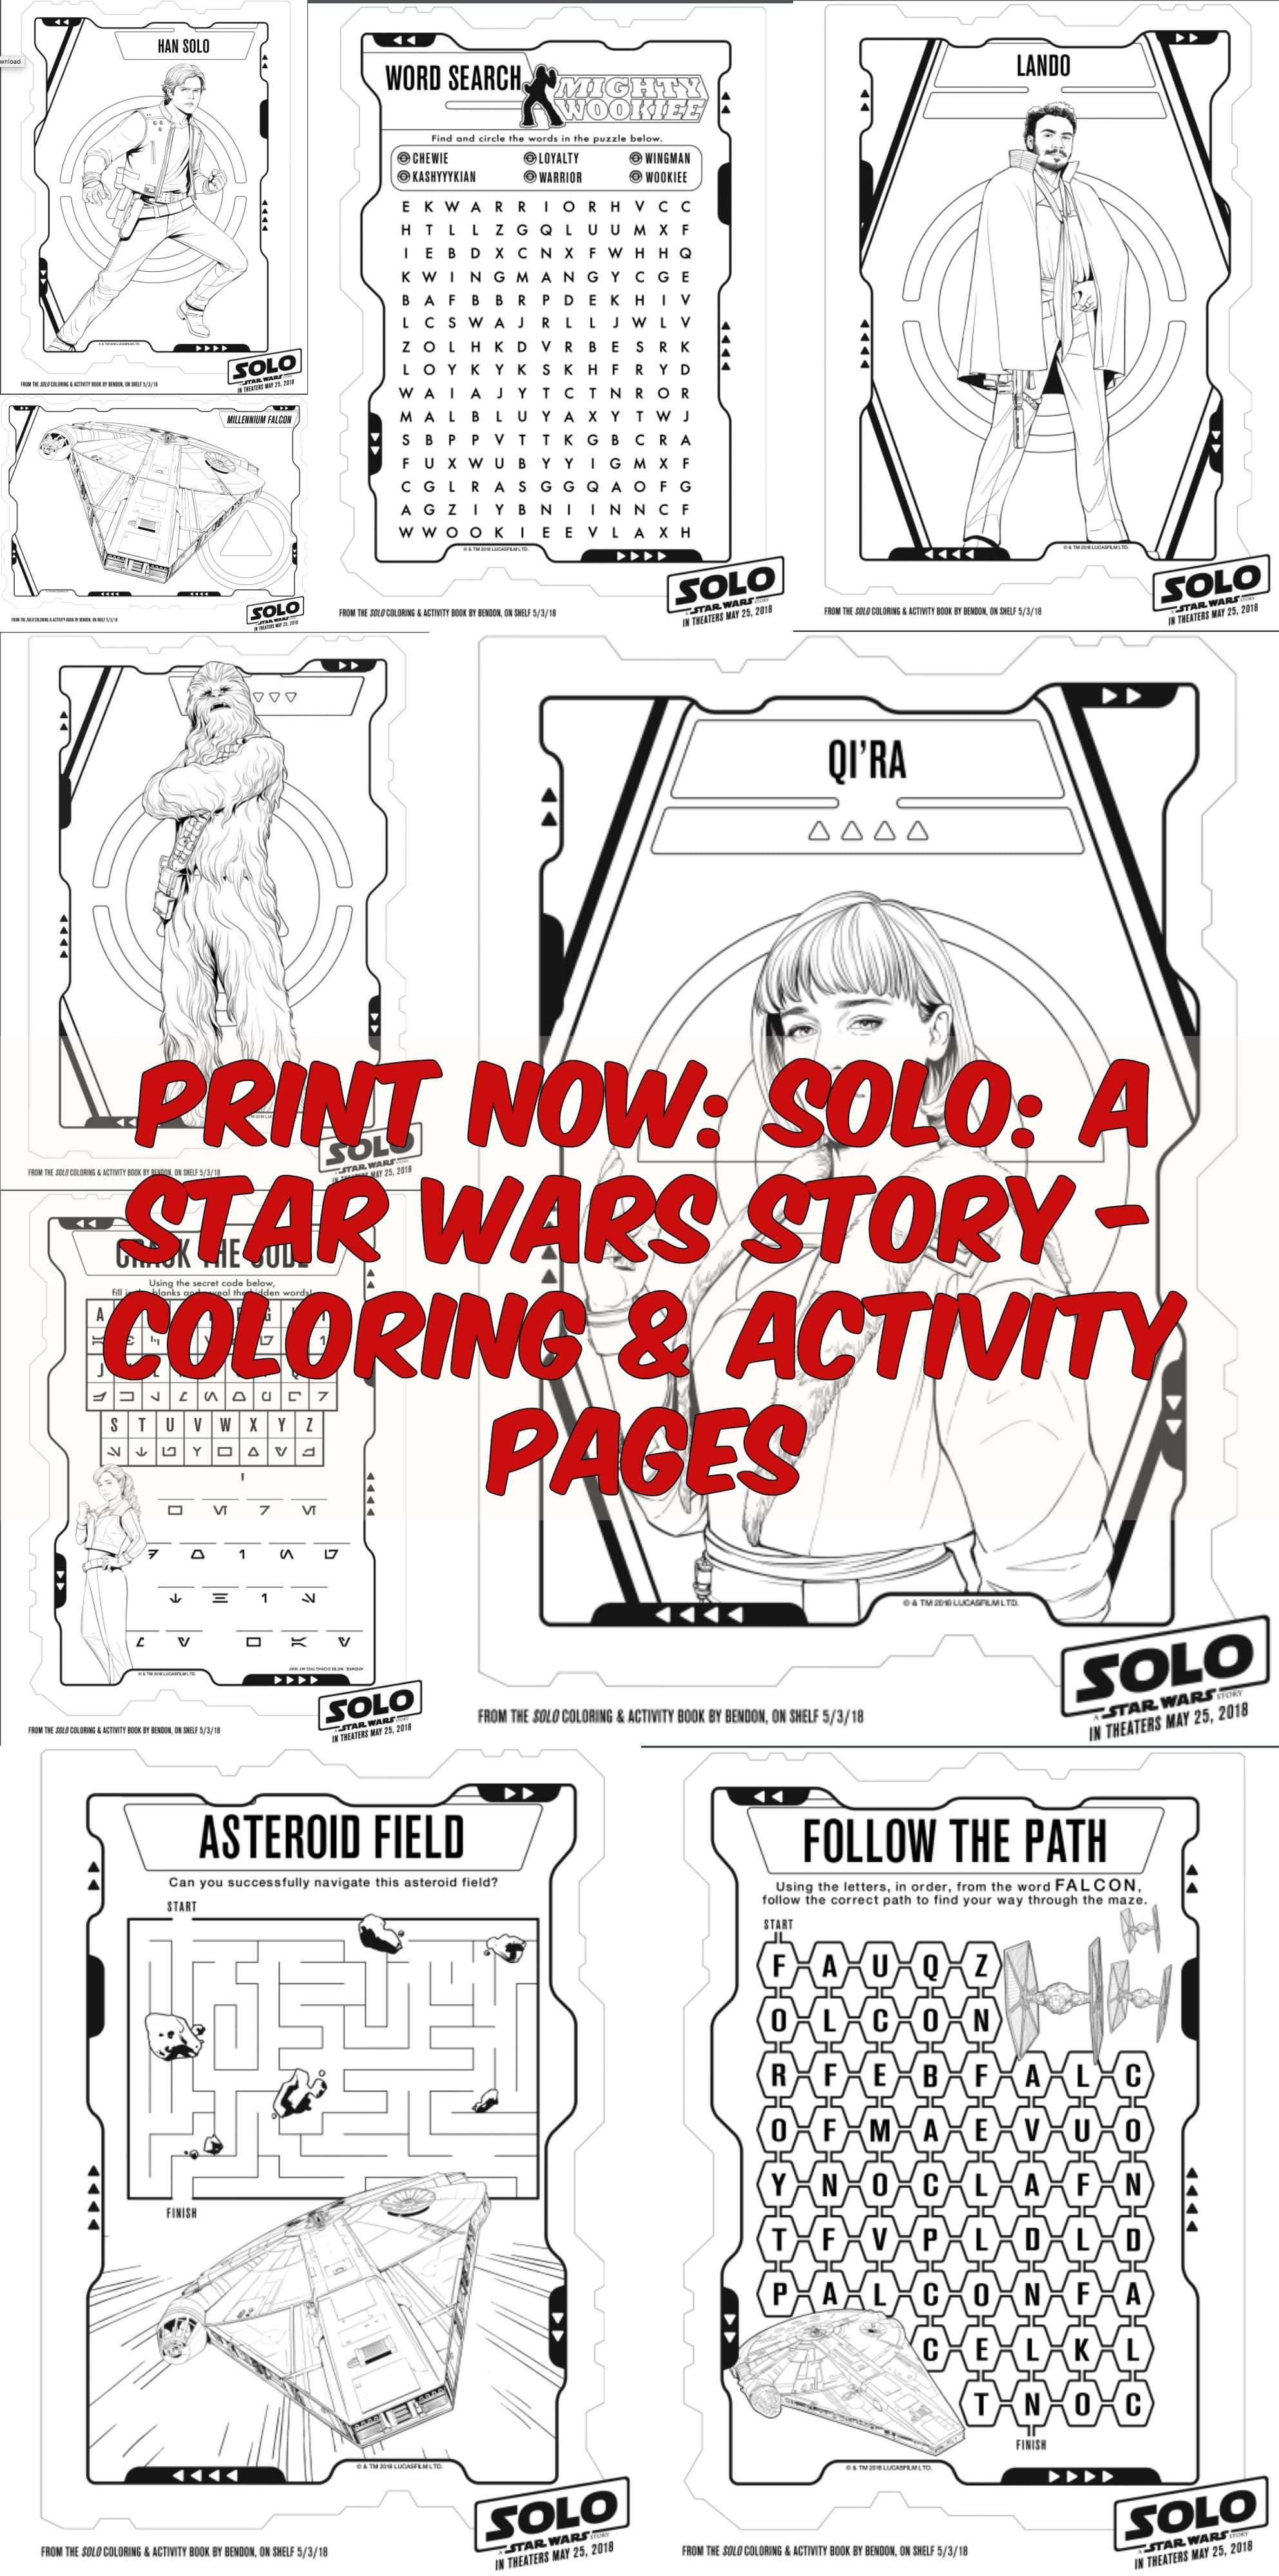 Star Wars Printable Worksheet Addition